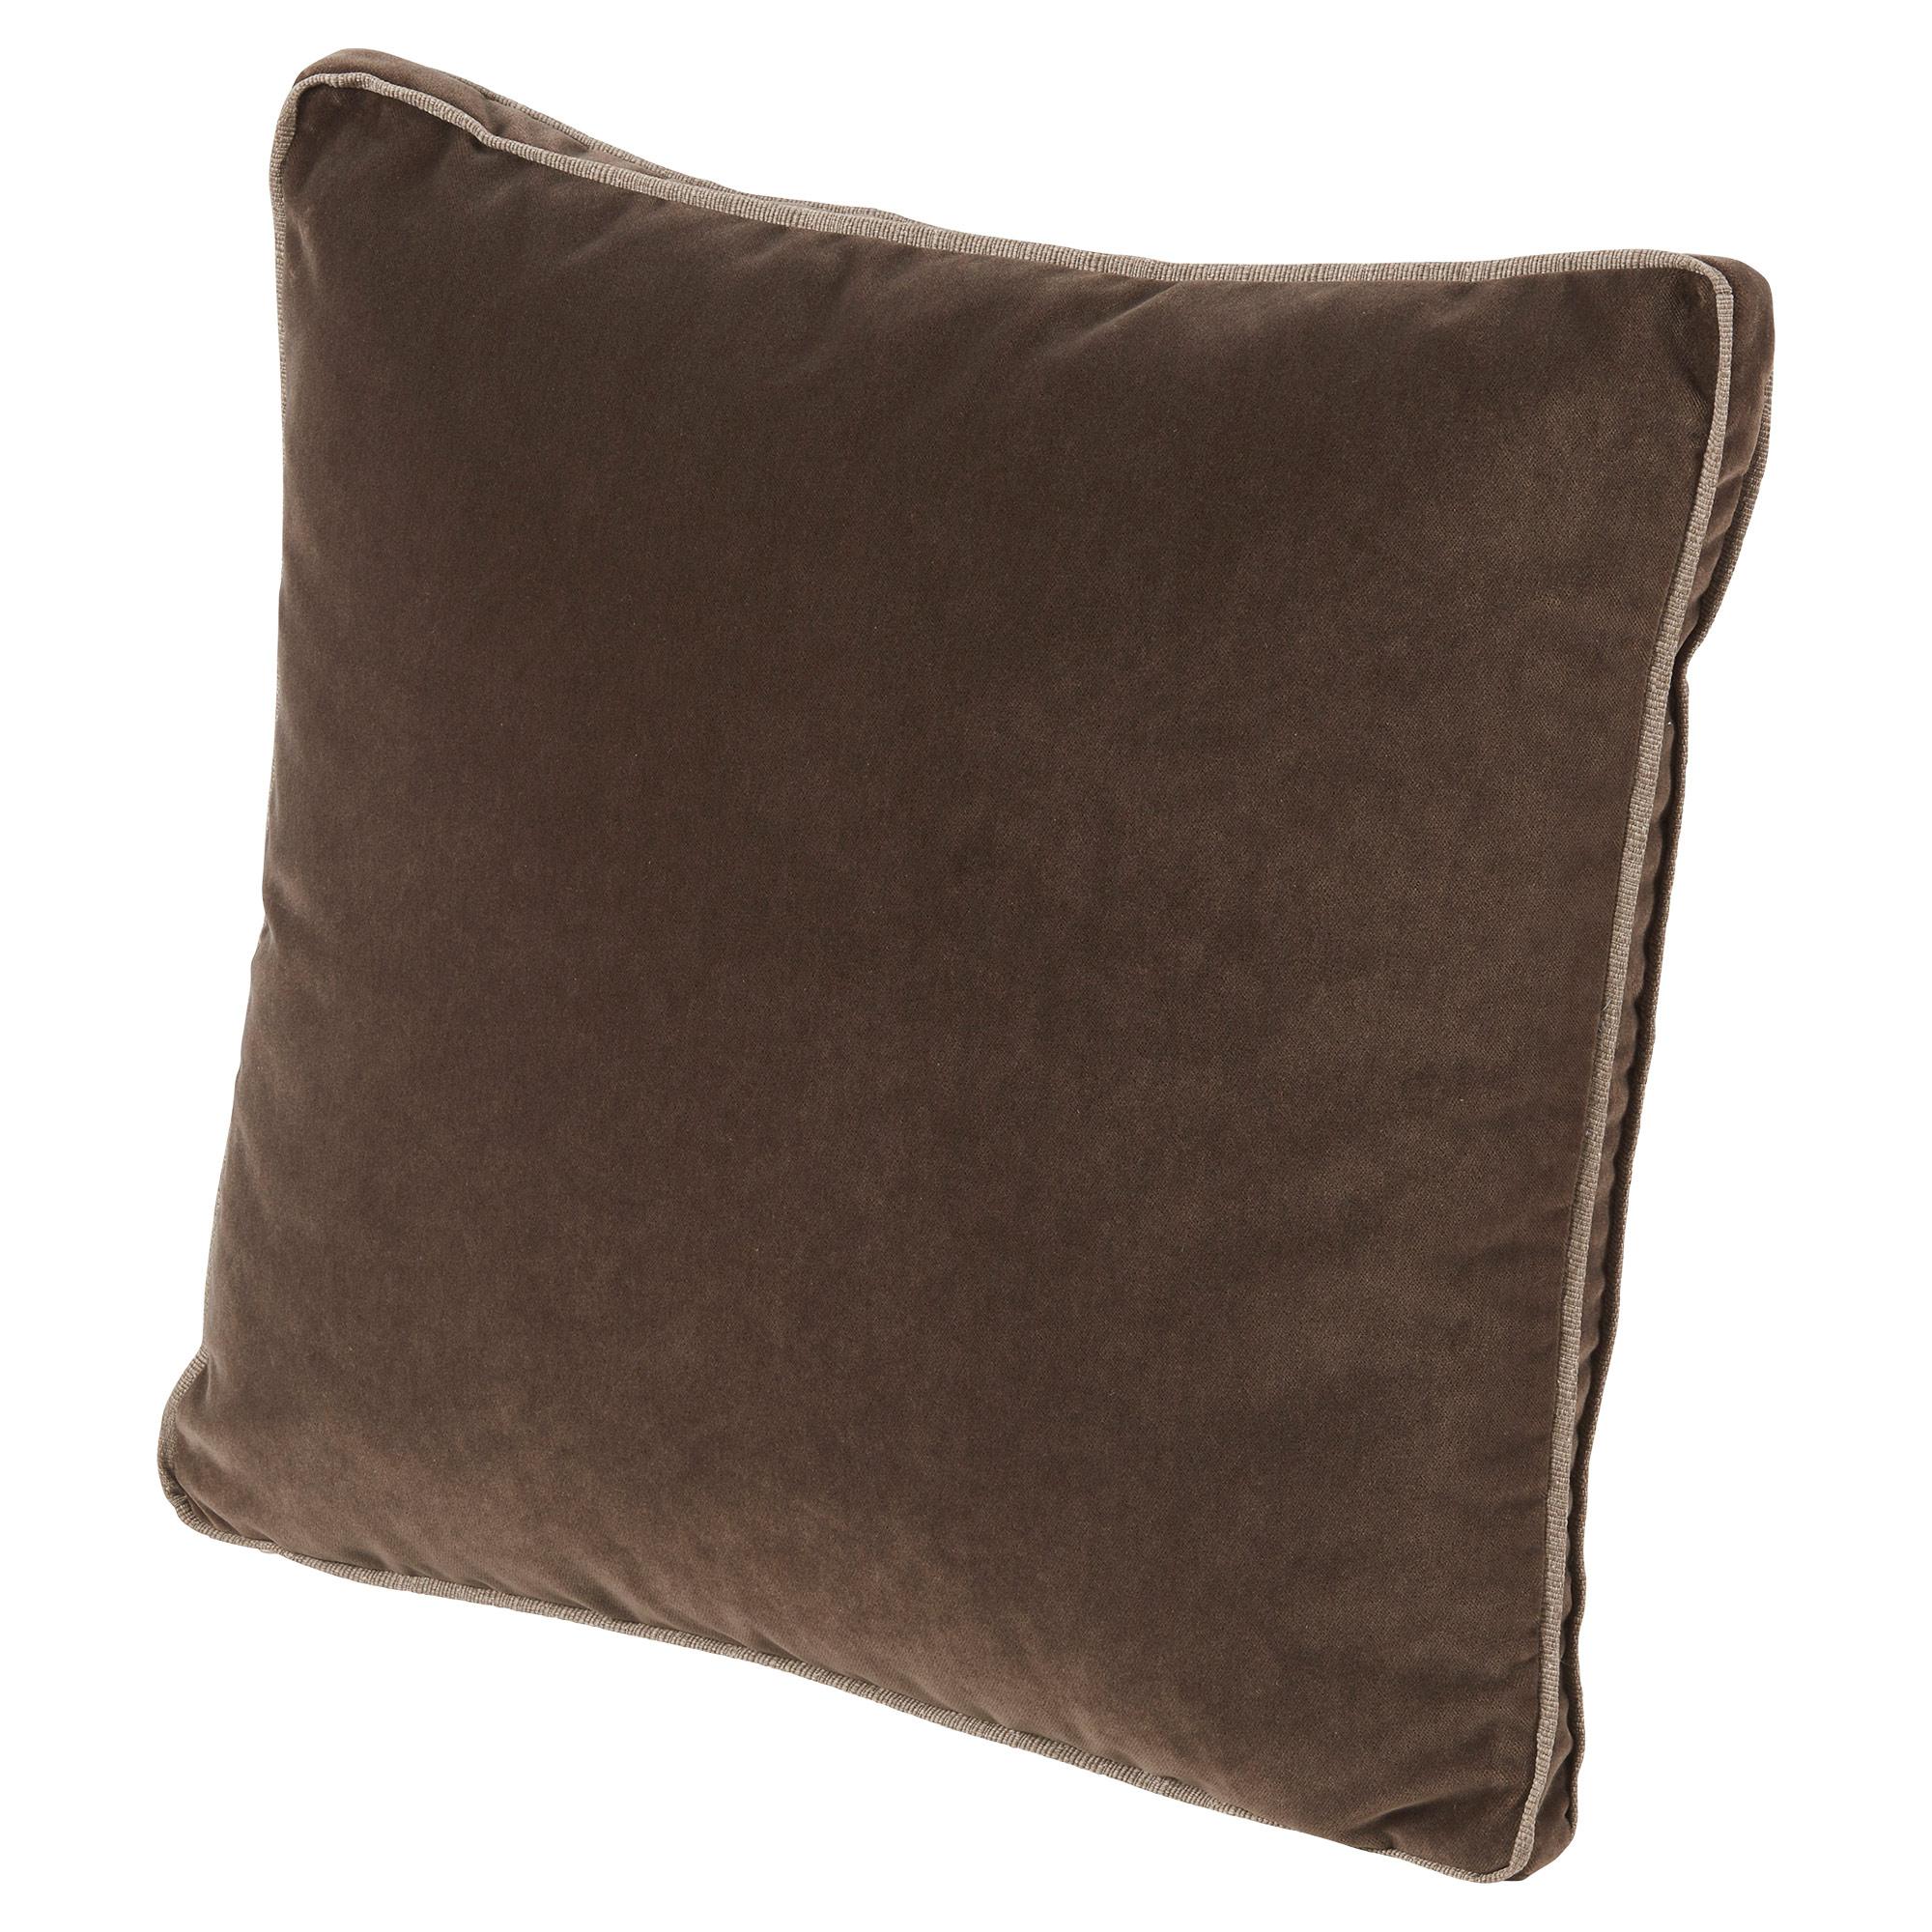 Tildy Classic Chocolate Brown Velvet Pillow - 22x22